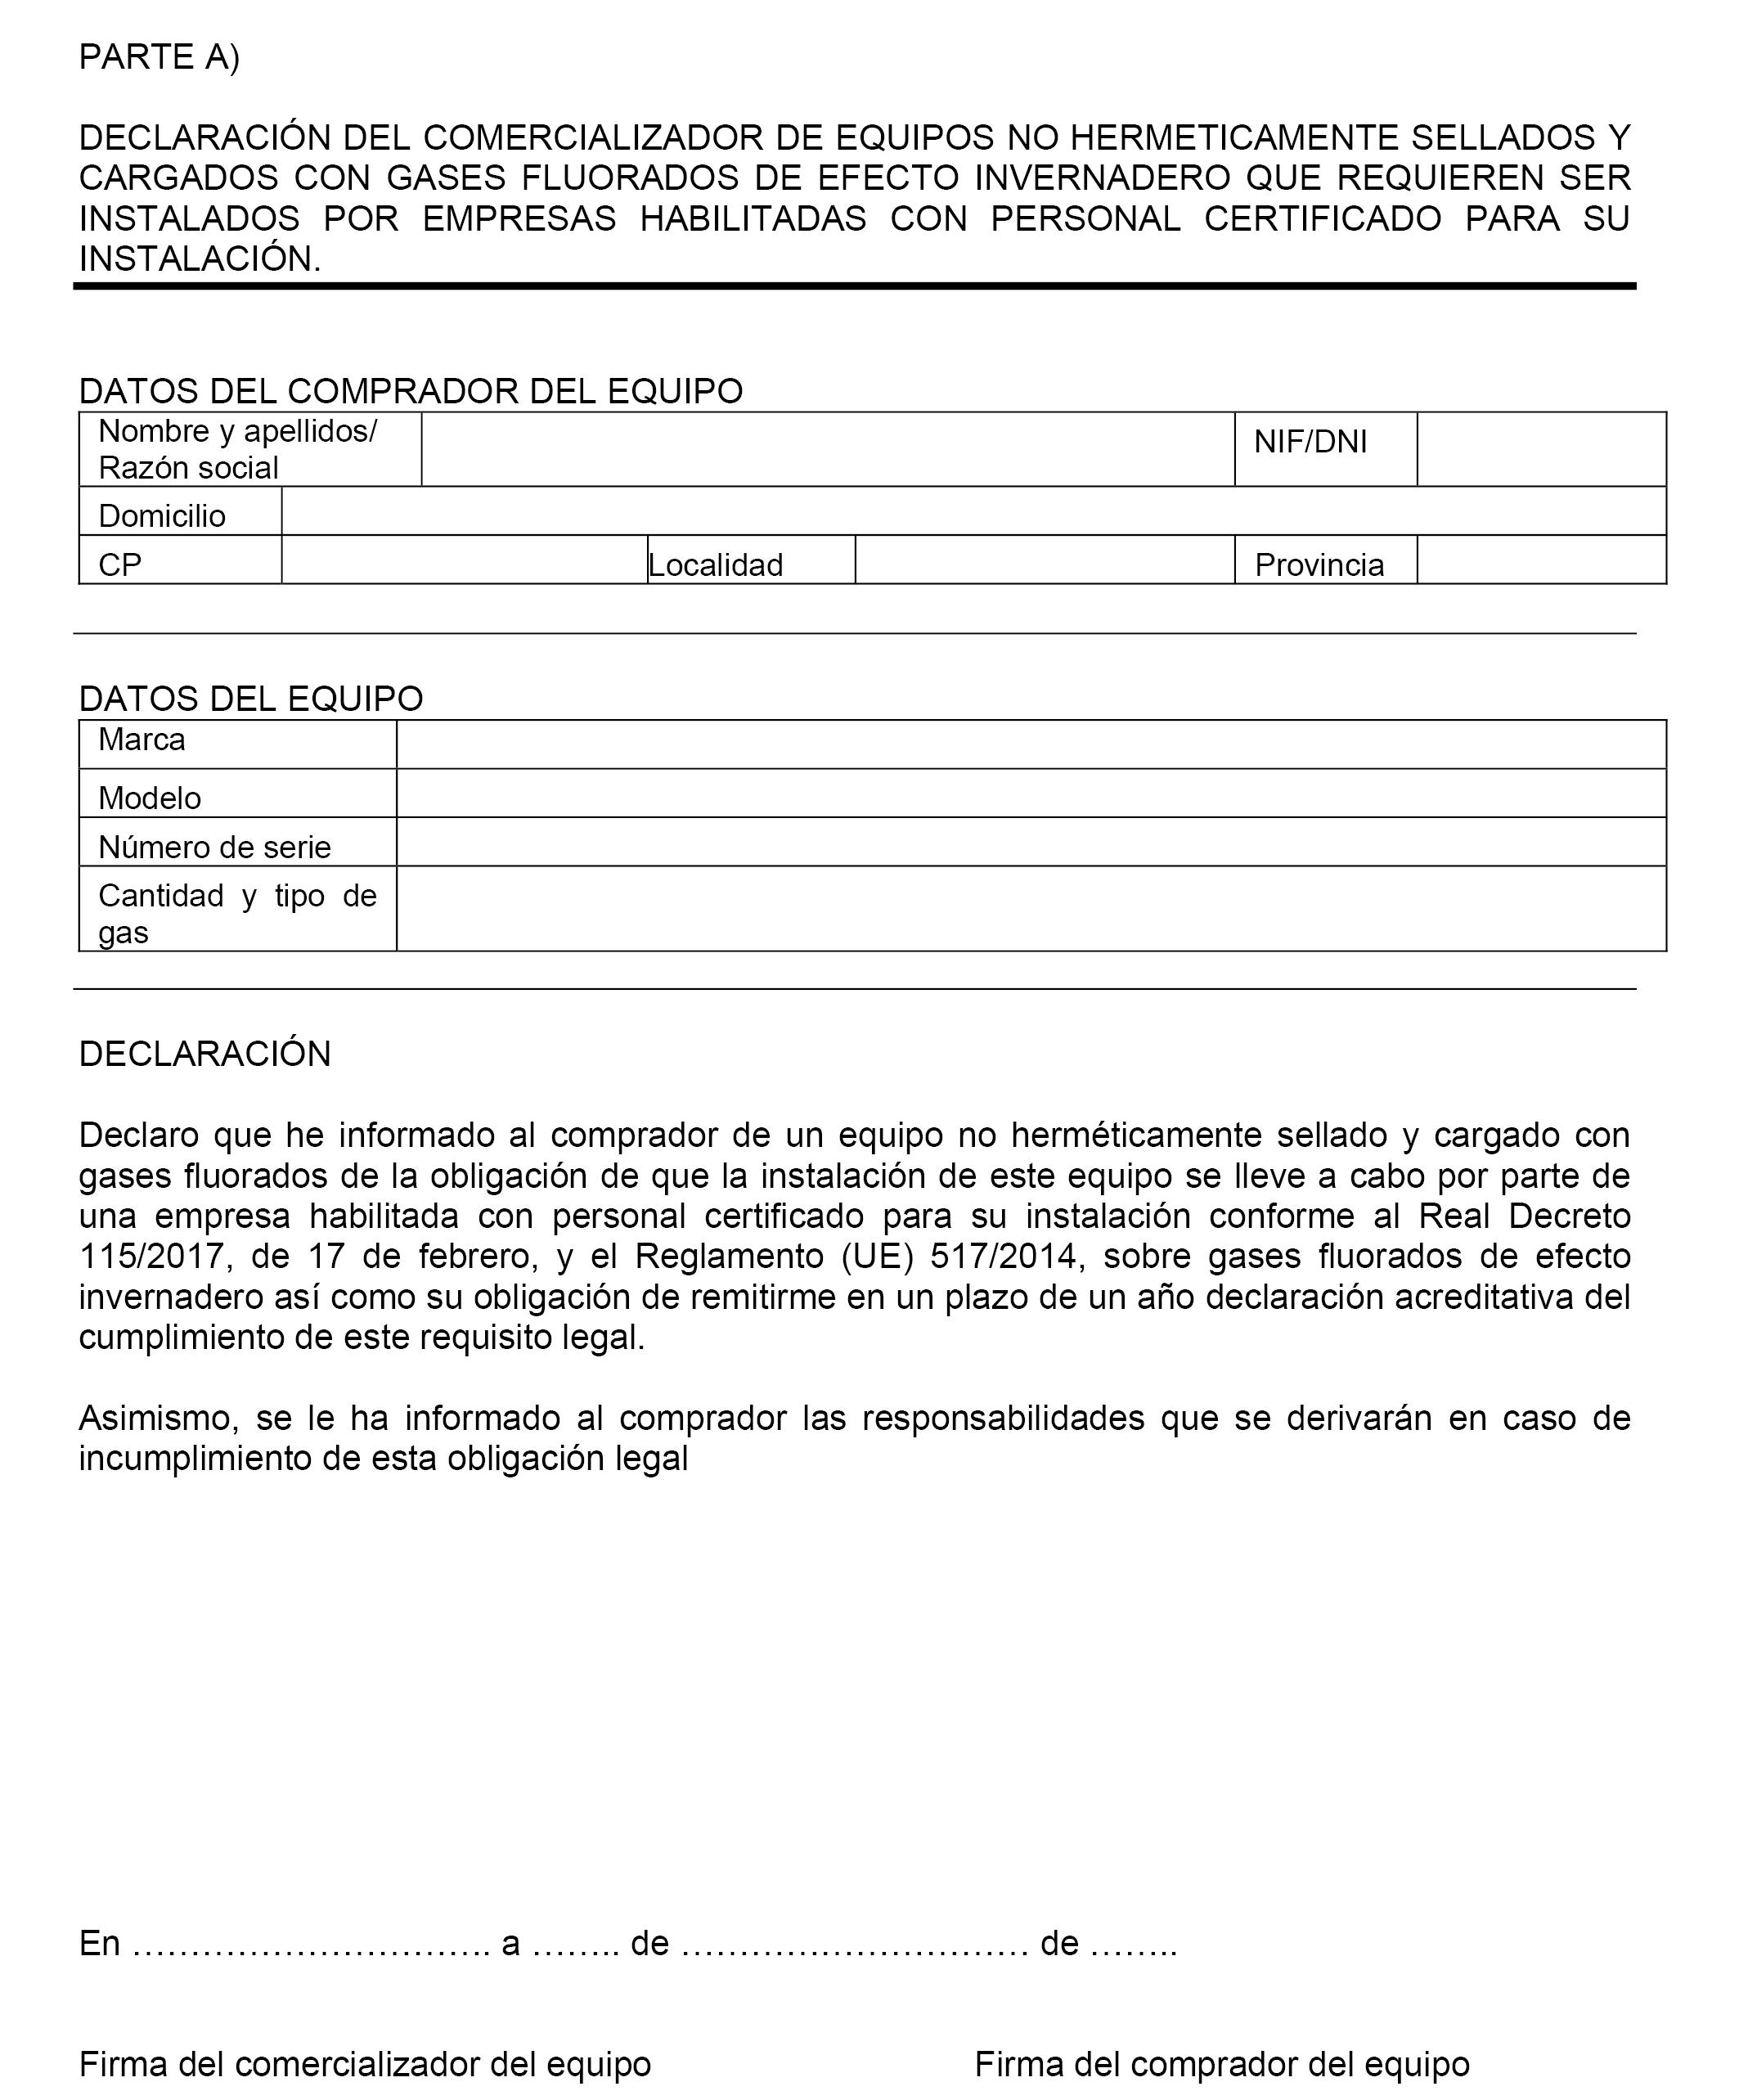 BOE.es - Documento BOE-A-2017-1679